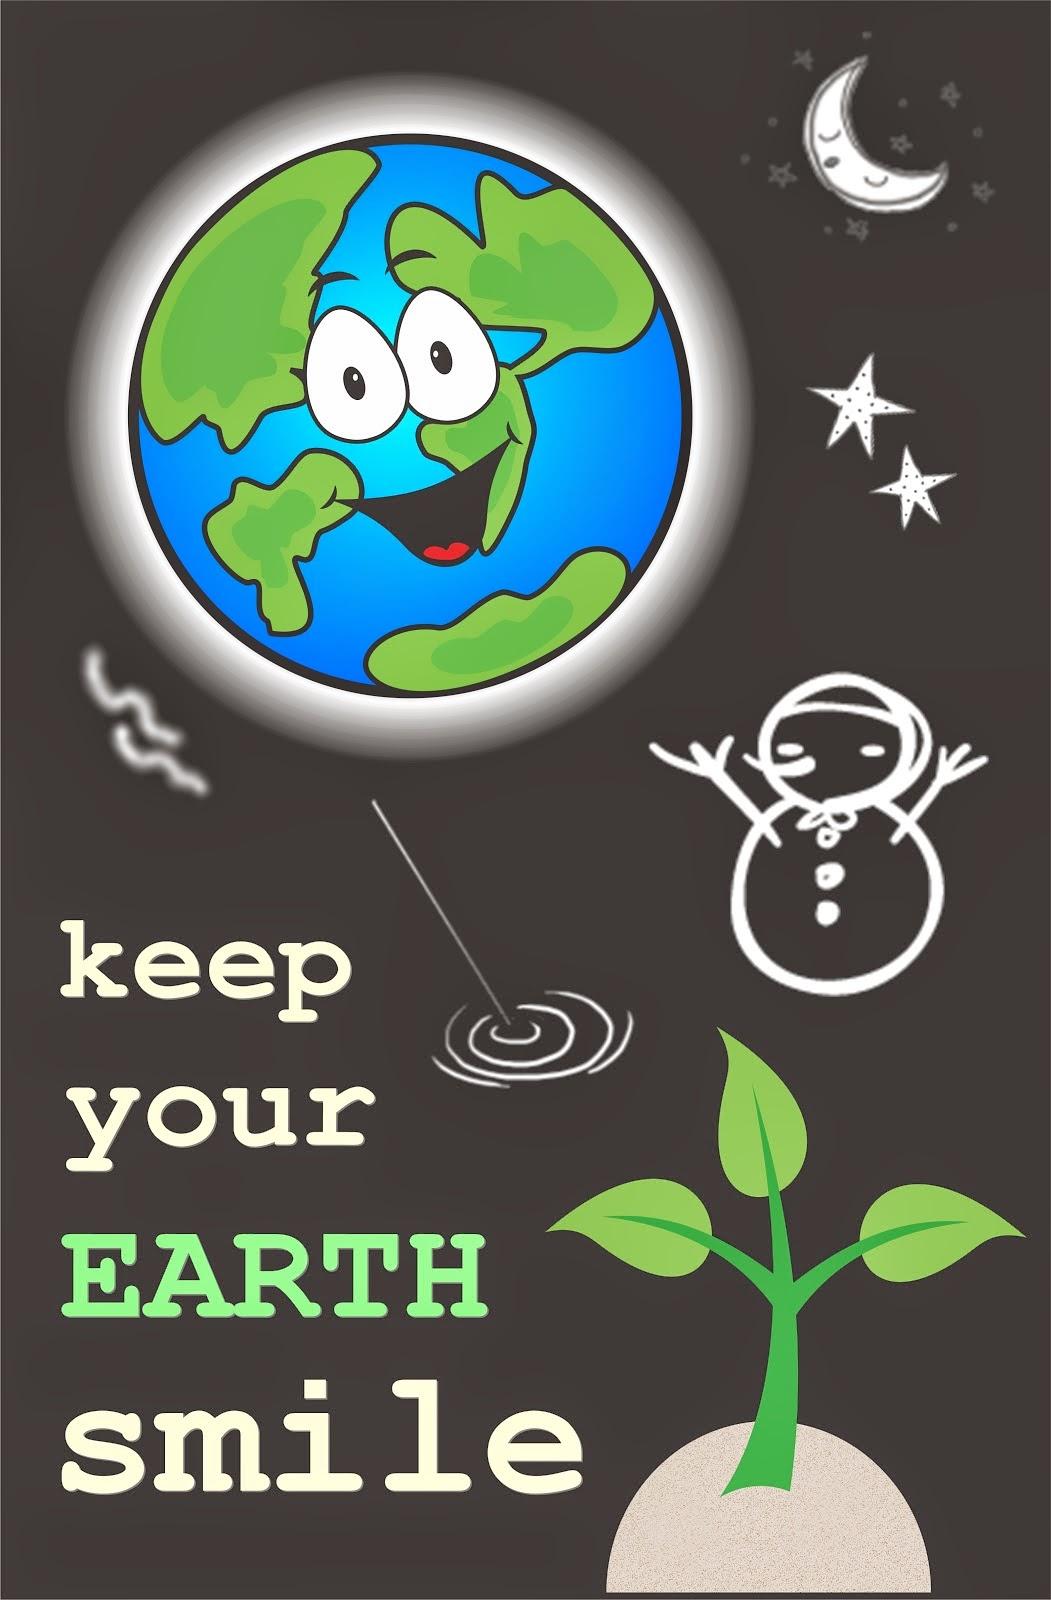 Kawoel S Blog Gambar Poster Lingkungan Hidup Adiwiyata Go Green